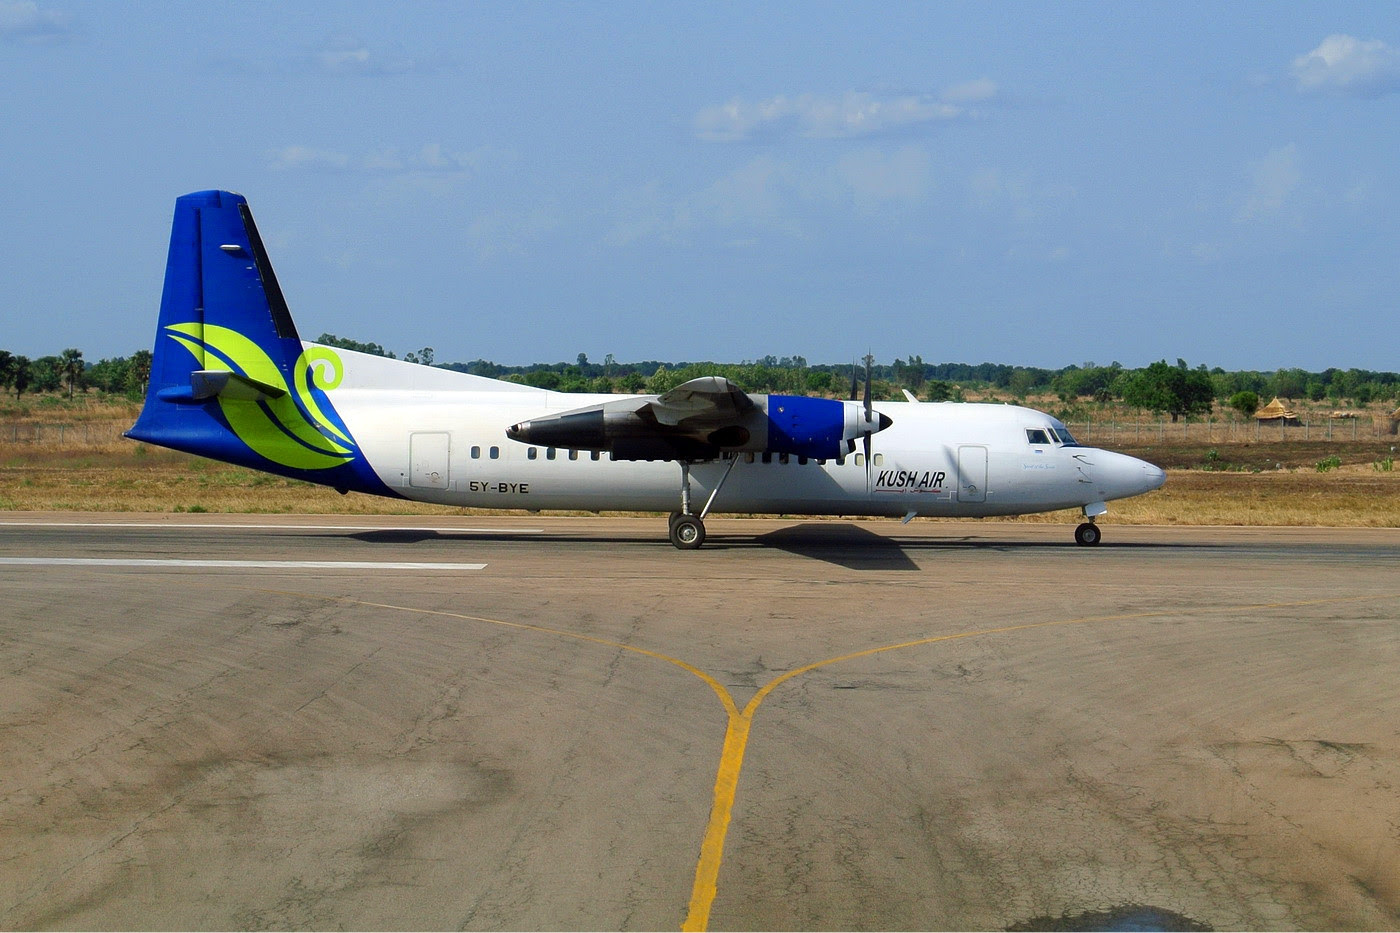 South Sudan's Kush Air in Juba, Sudan